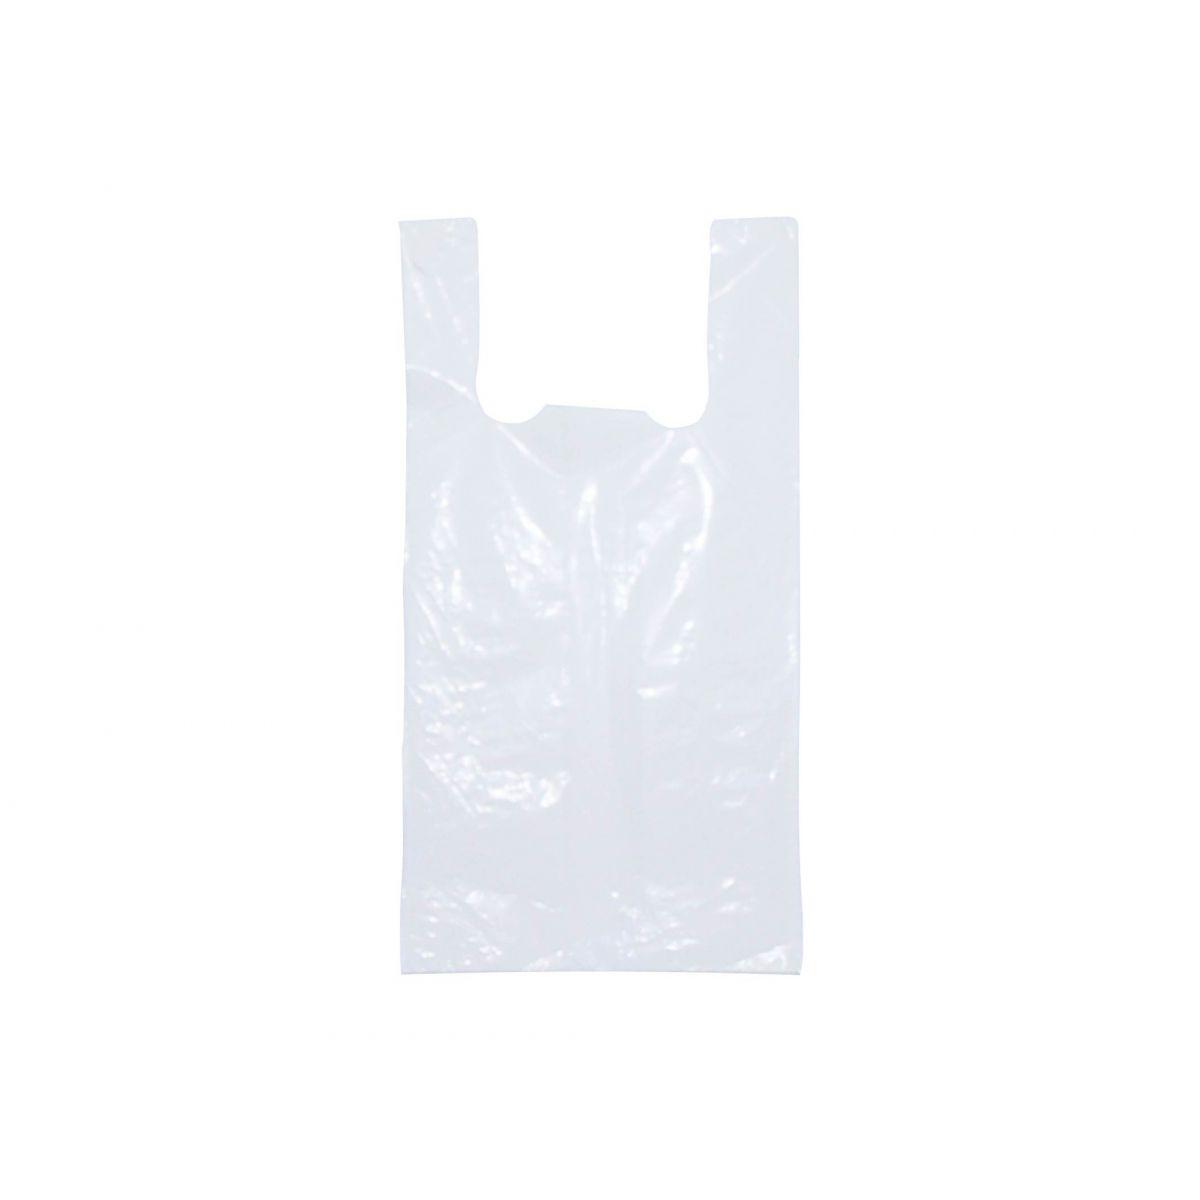 Sacola plástica Branca - 43x60cm (espessura fina)- Pacote 1000 unid